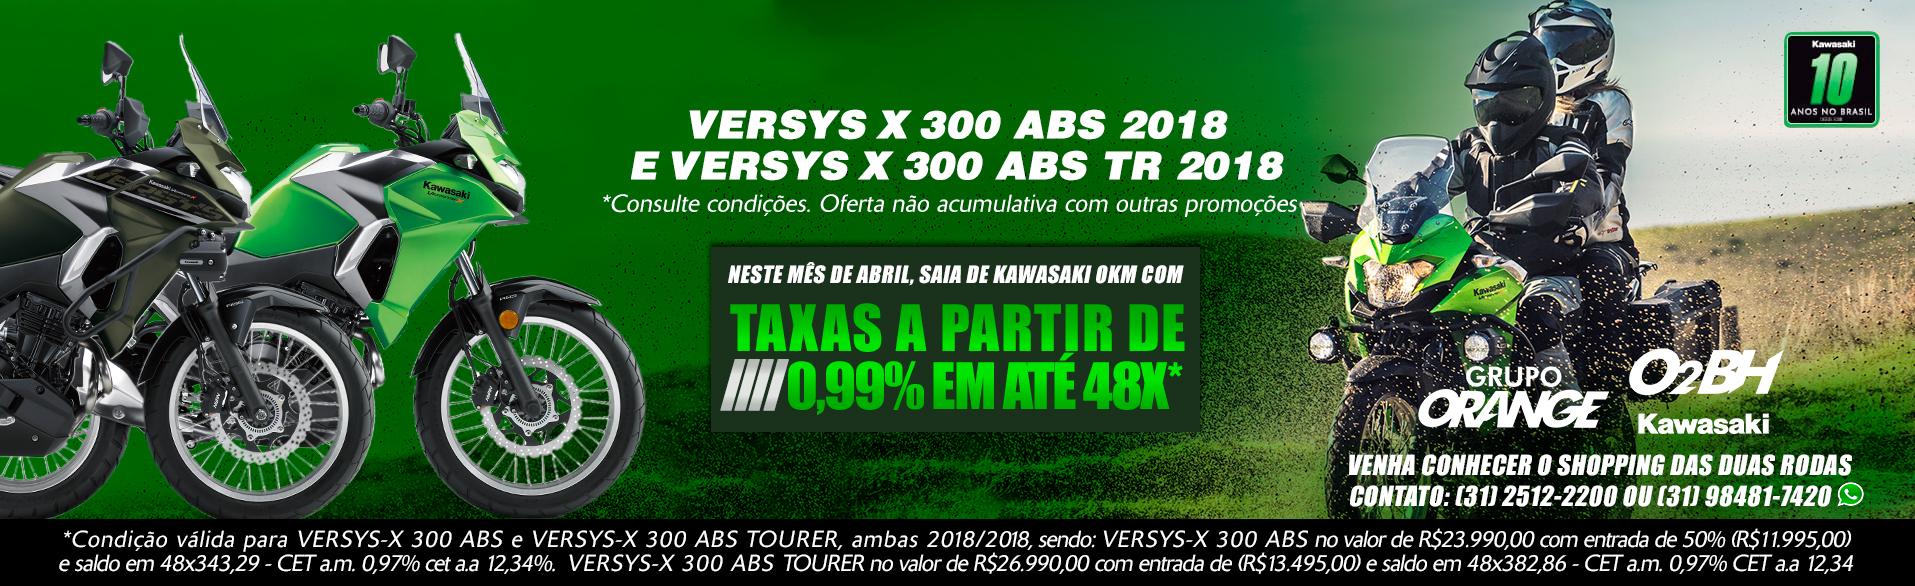 Versys-X 300 ABS e Versys-X 300 Tourer ABS